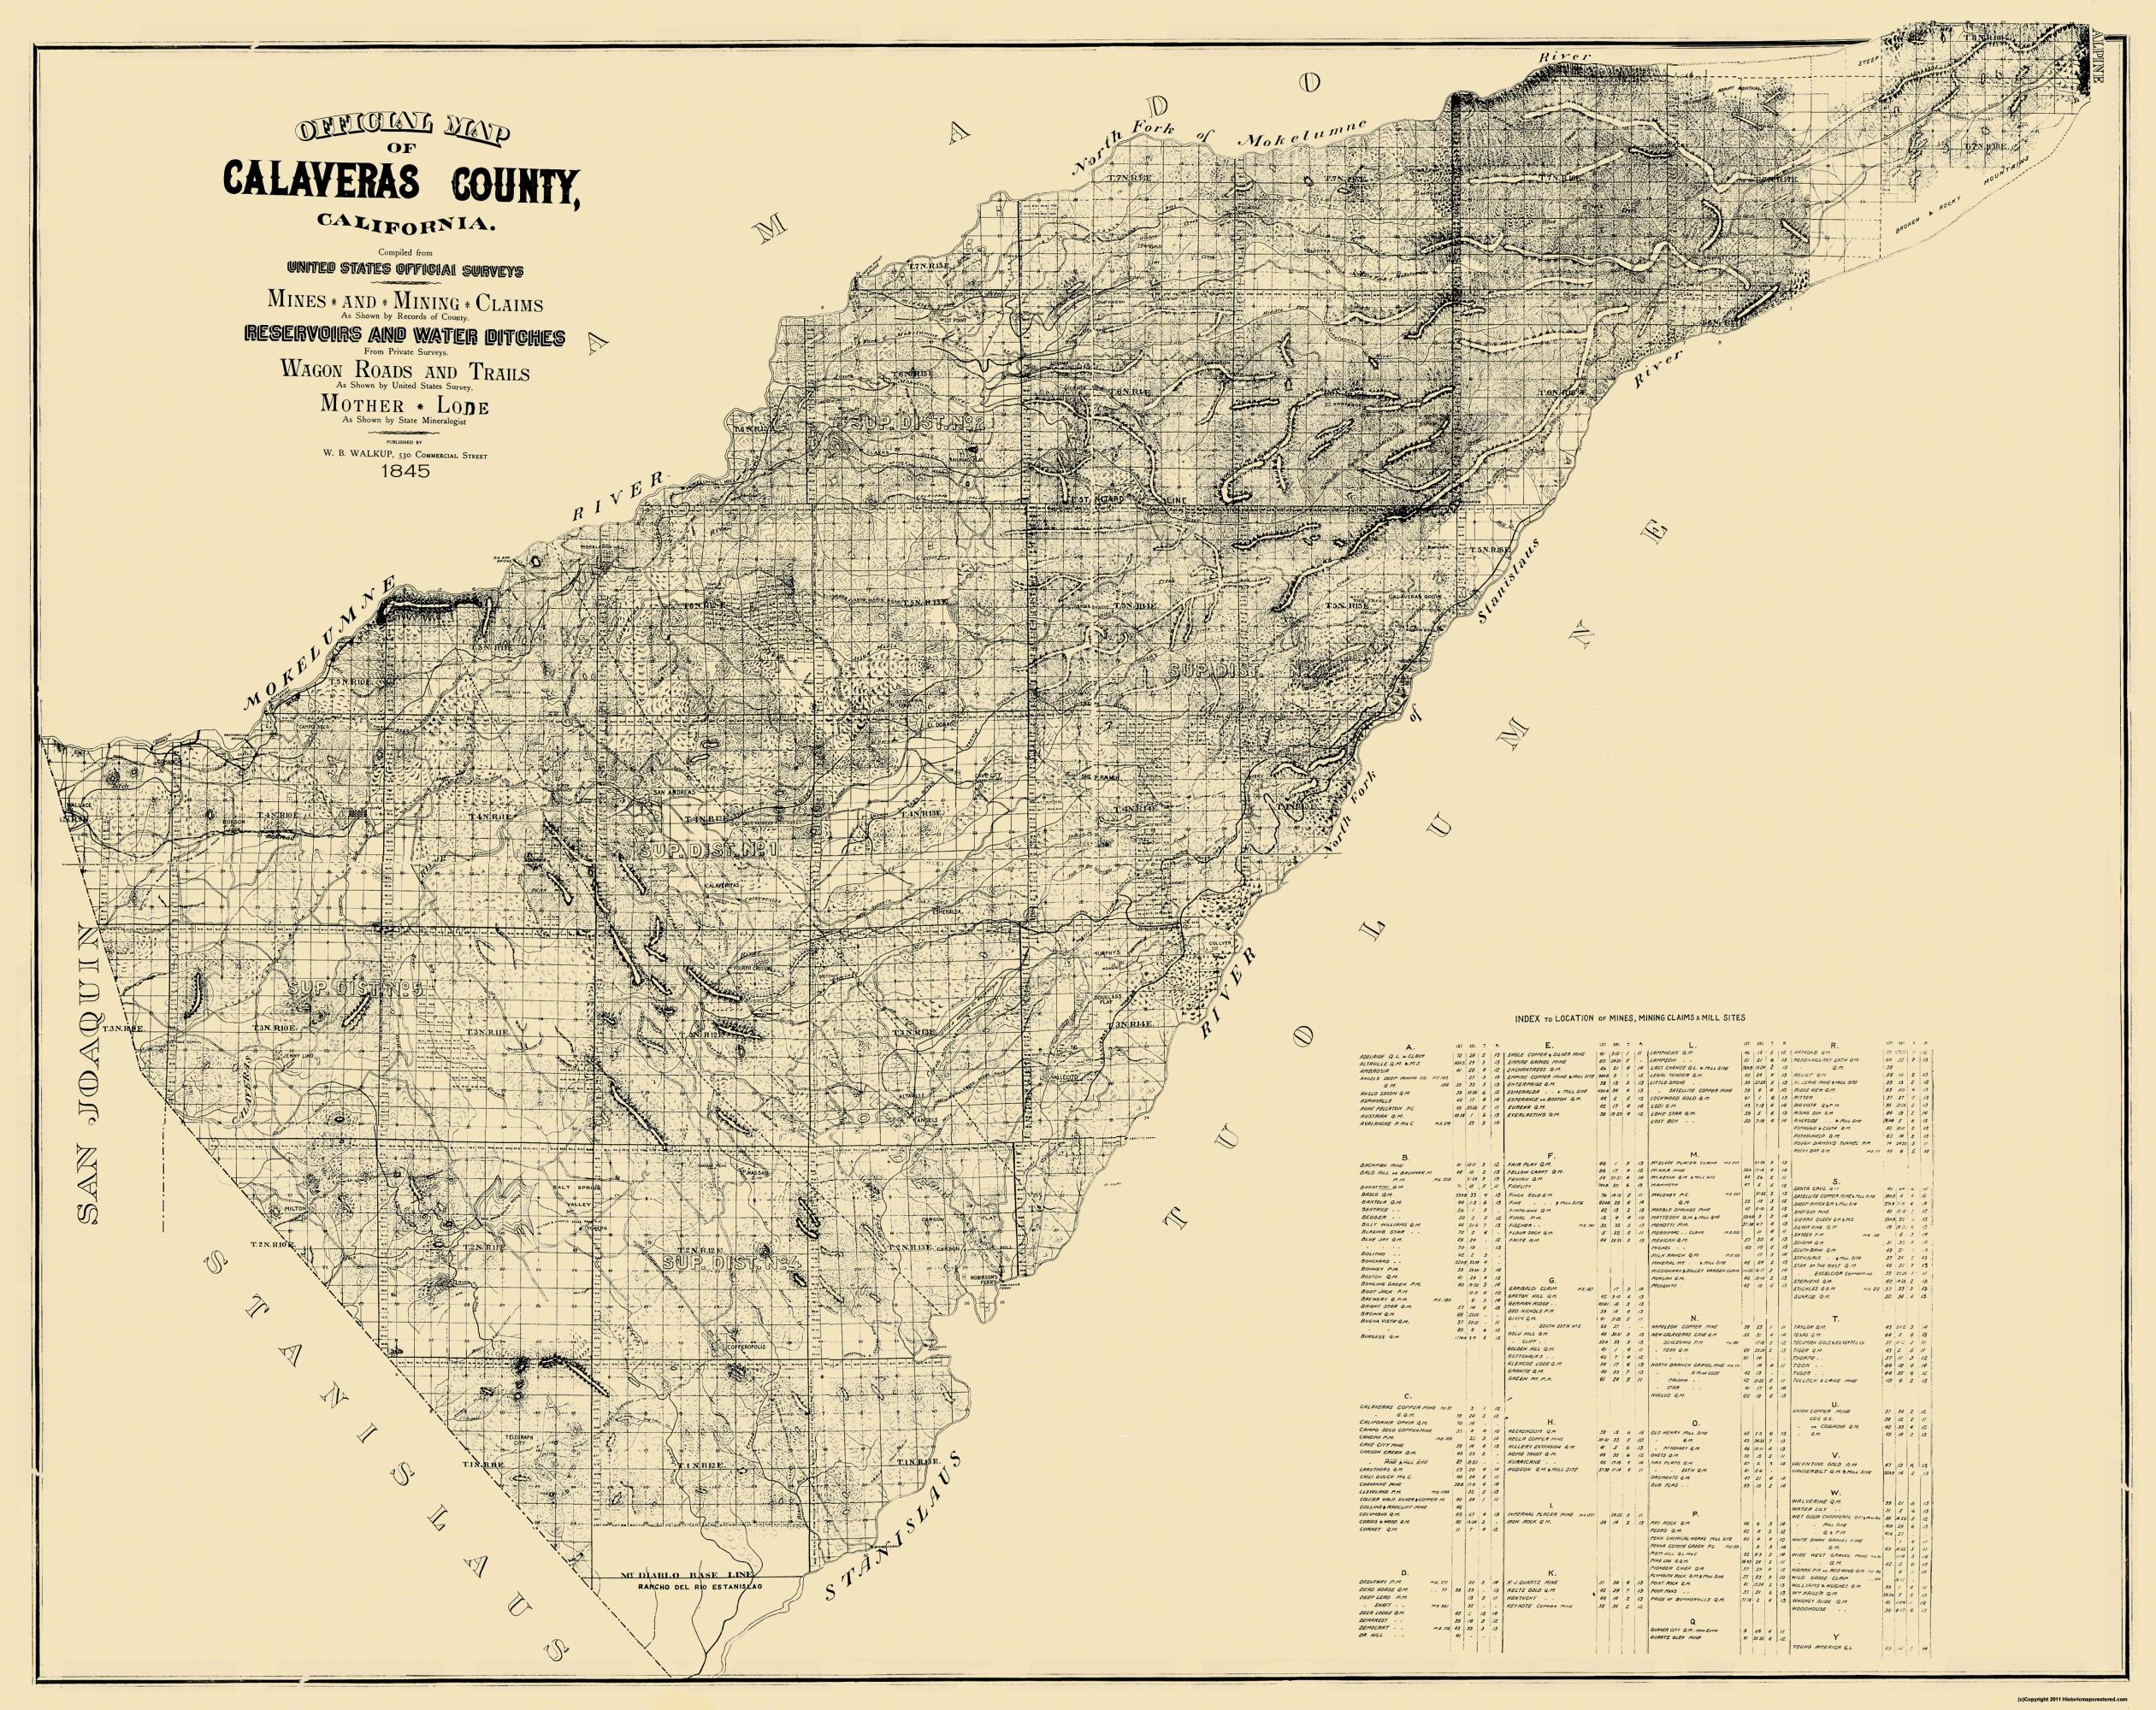 Old Map - Calaveras California Mines, Mining Claims 1845 - Gold Prospecting Maps California